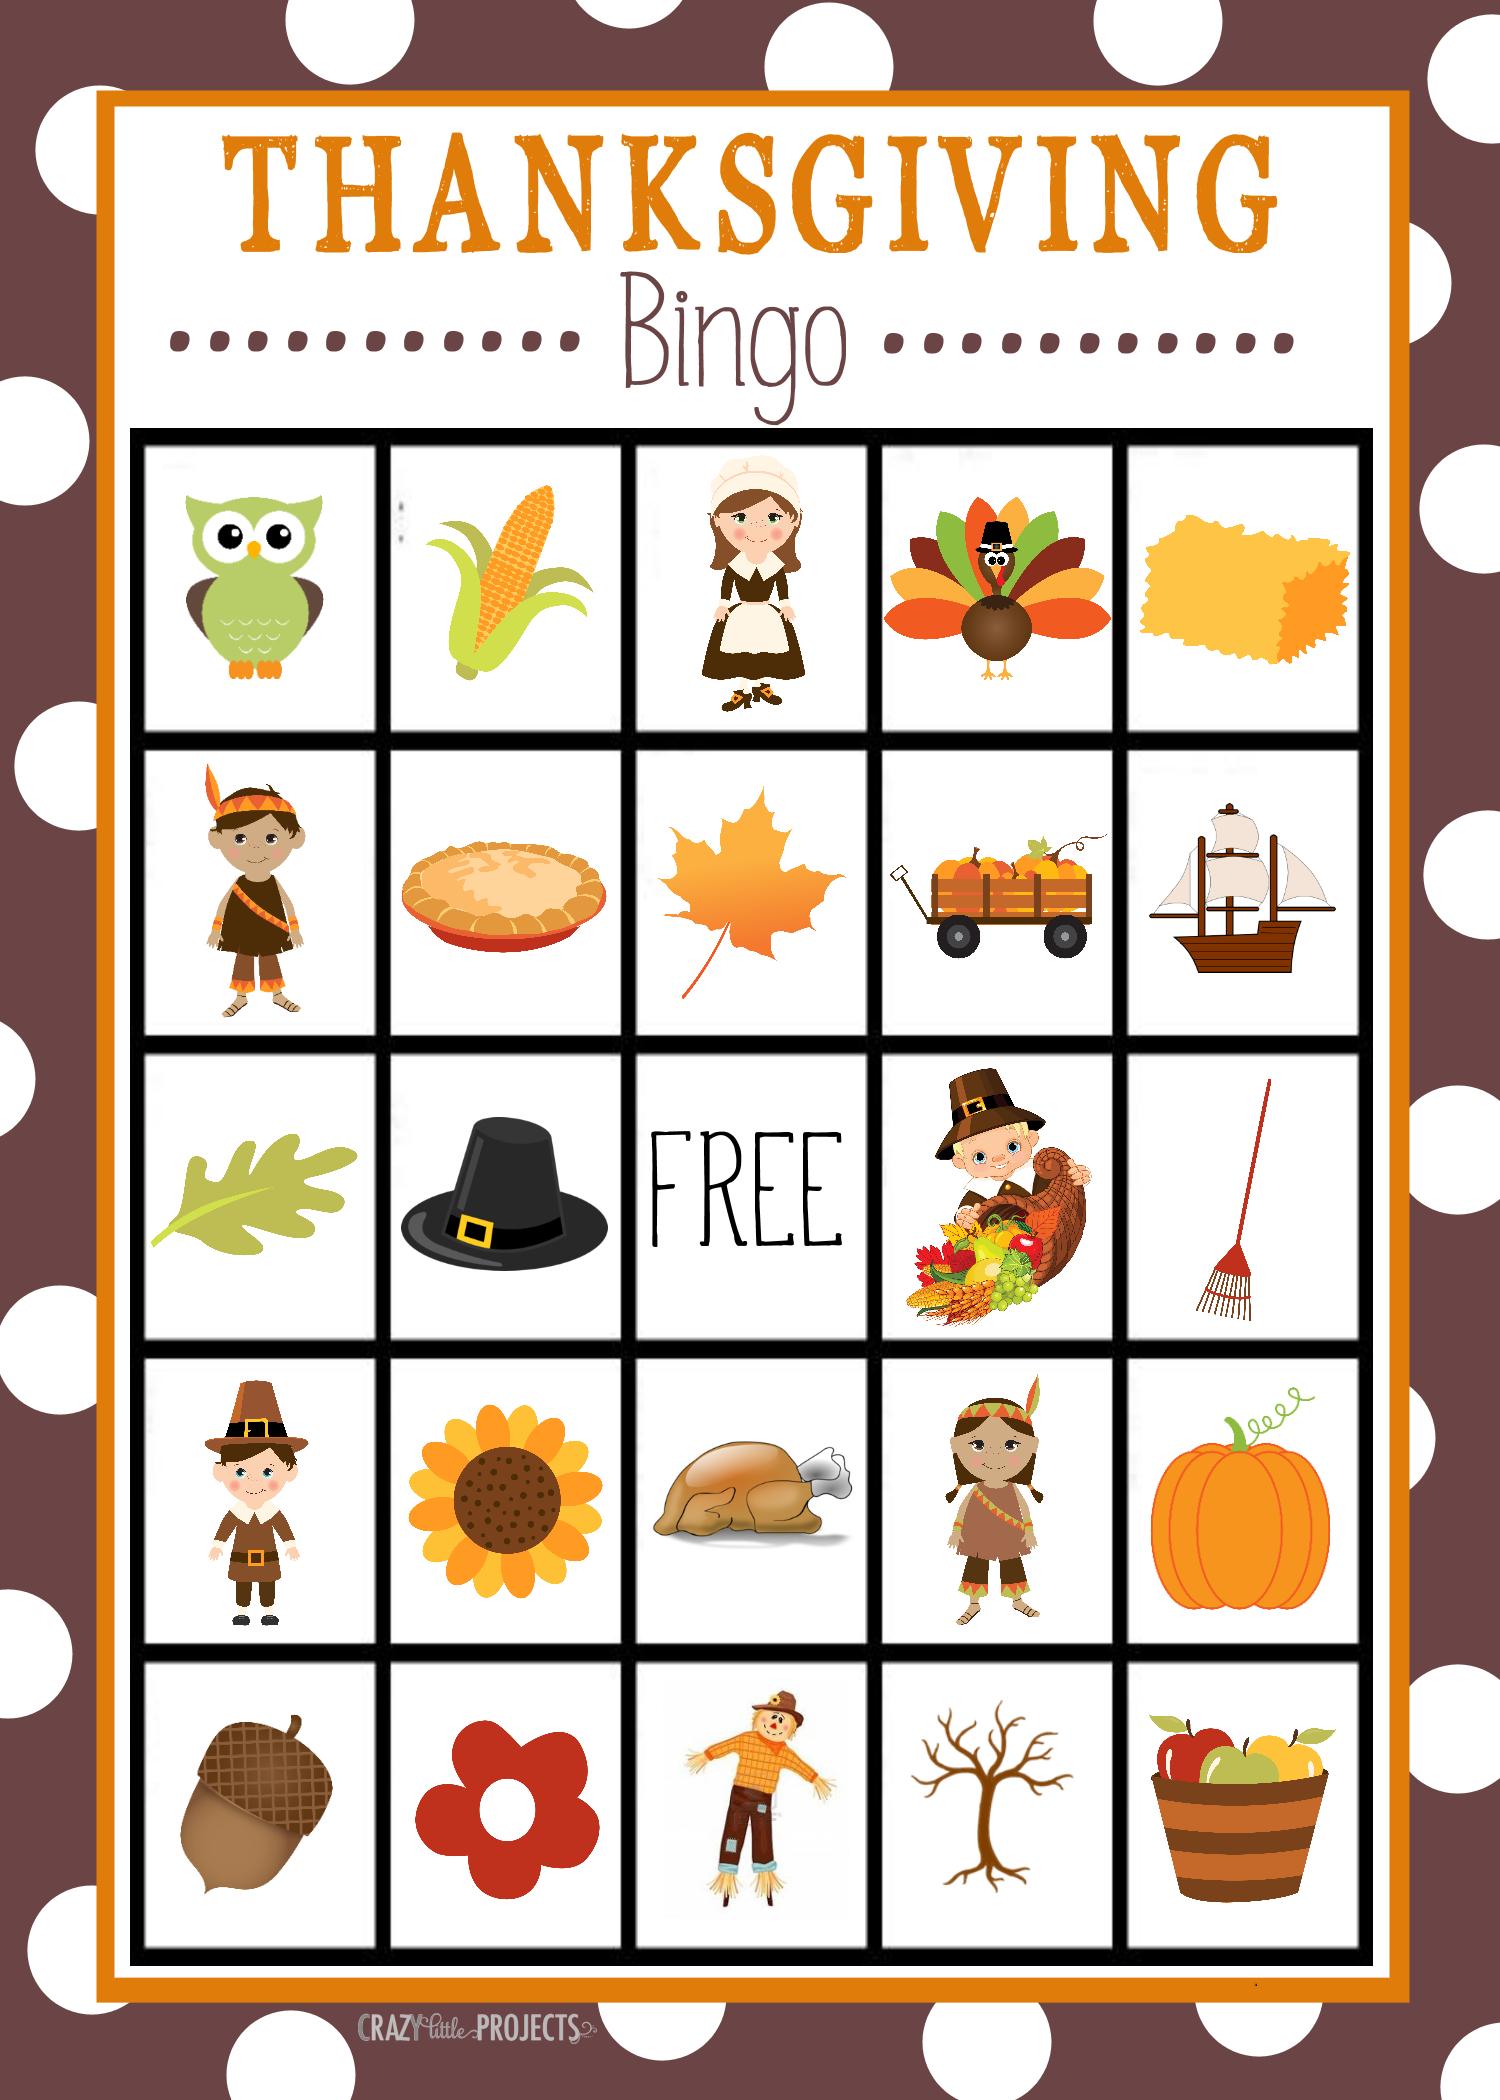 Free Printable Thanksgiving Bingo Game | Christmas Bingo